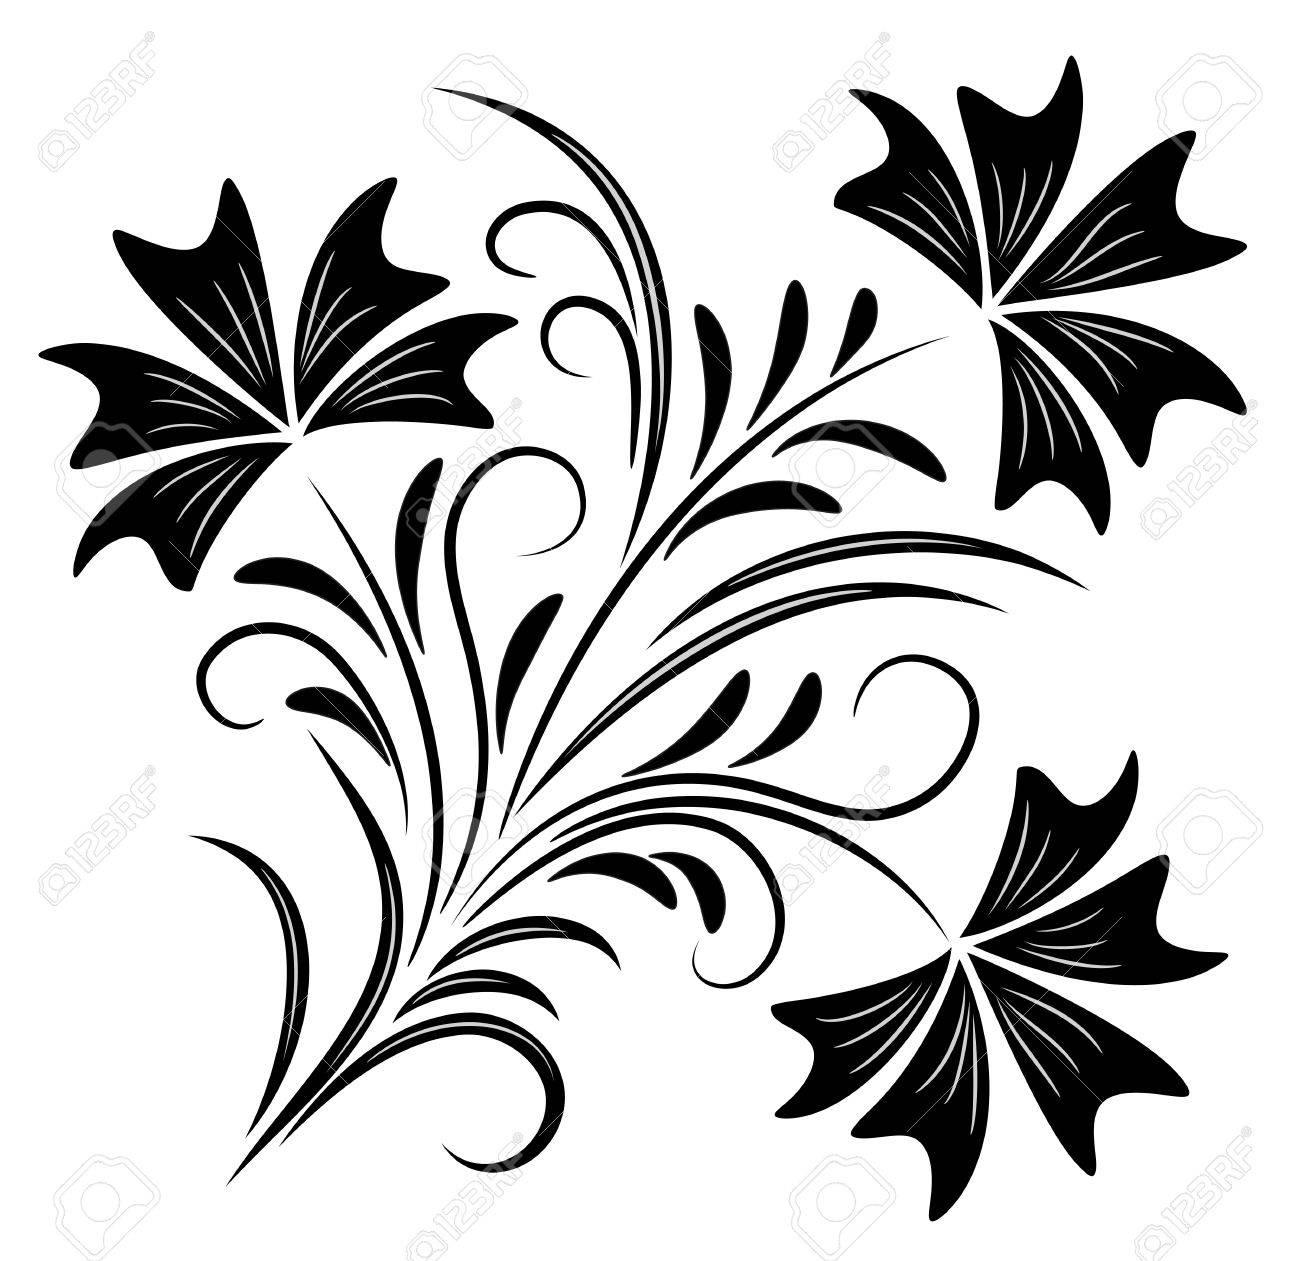 Decorative ornament for various design artwork Stock Vector - 10343061